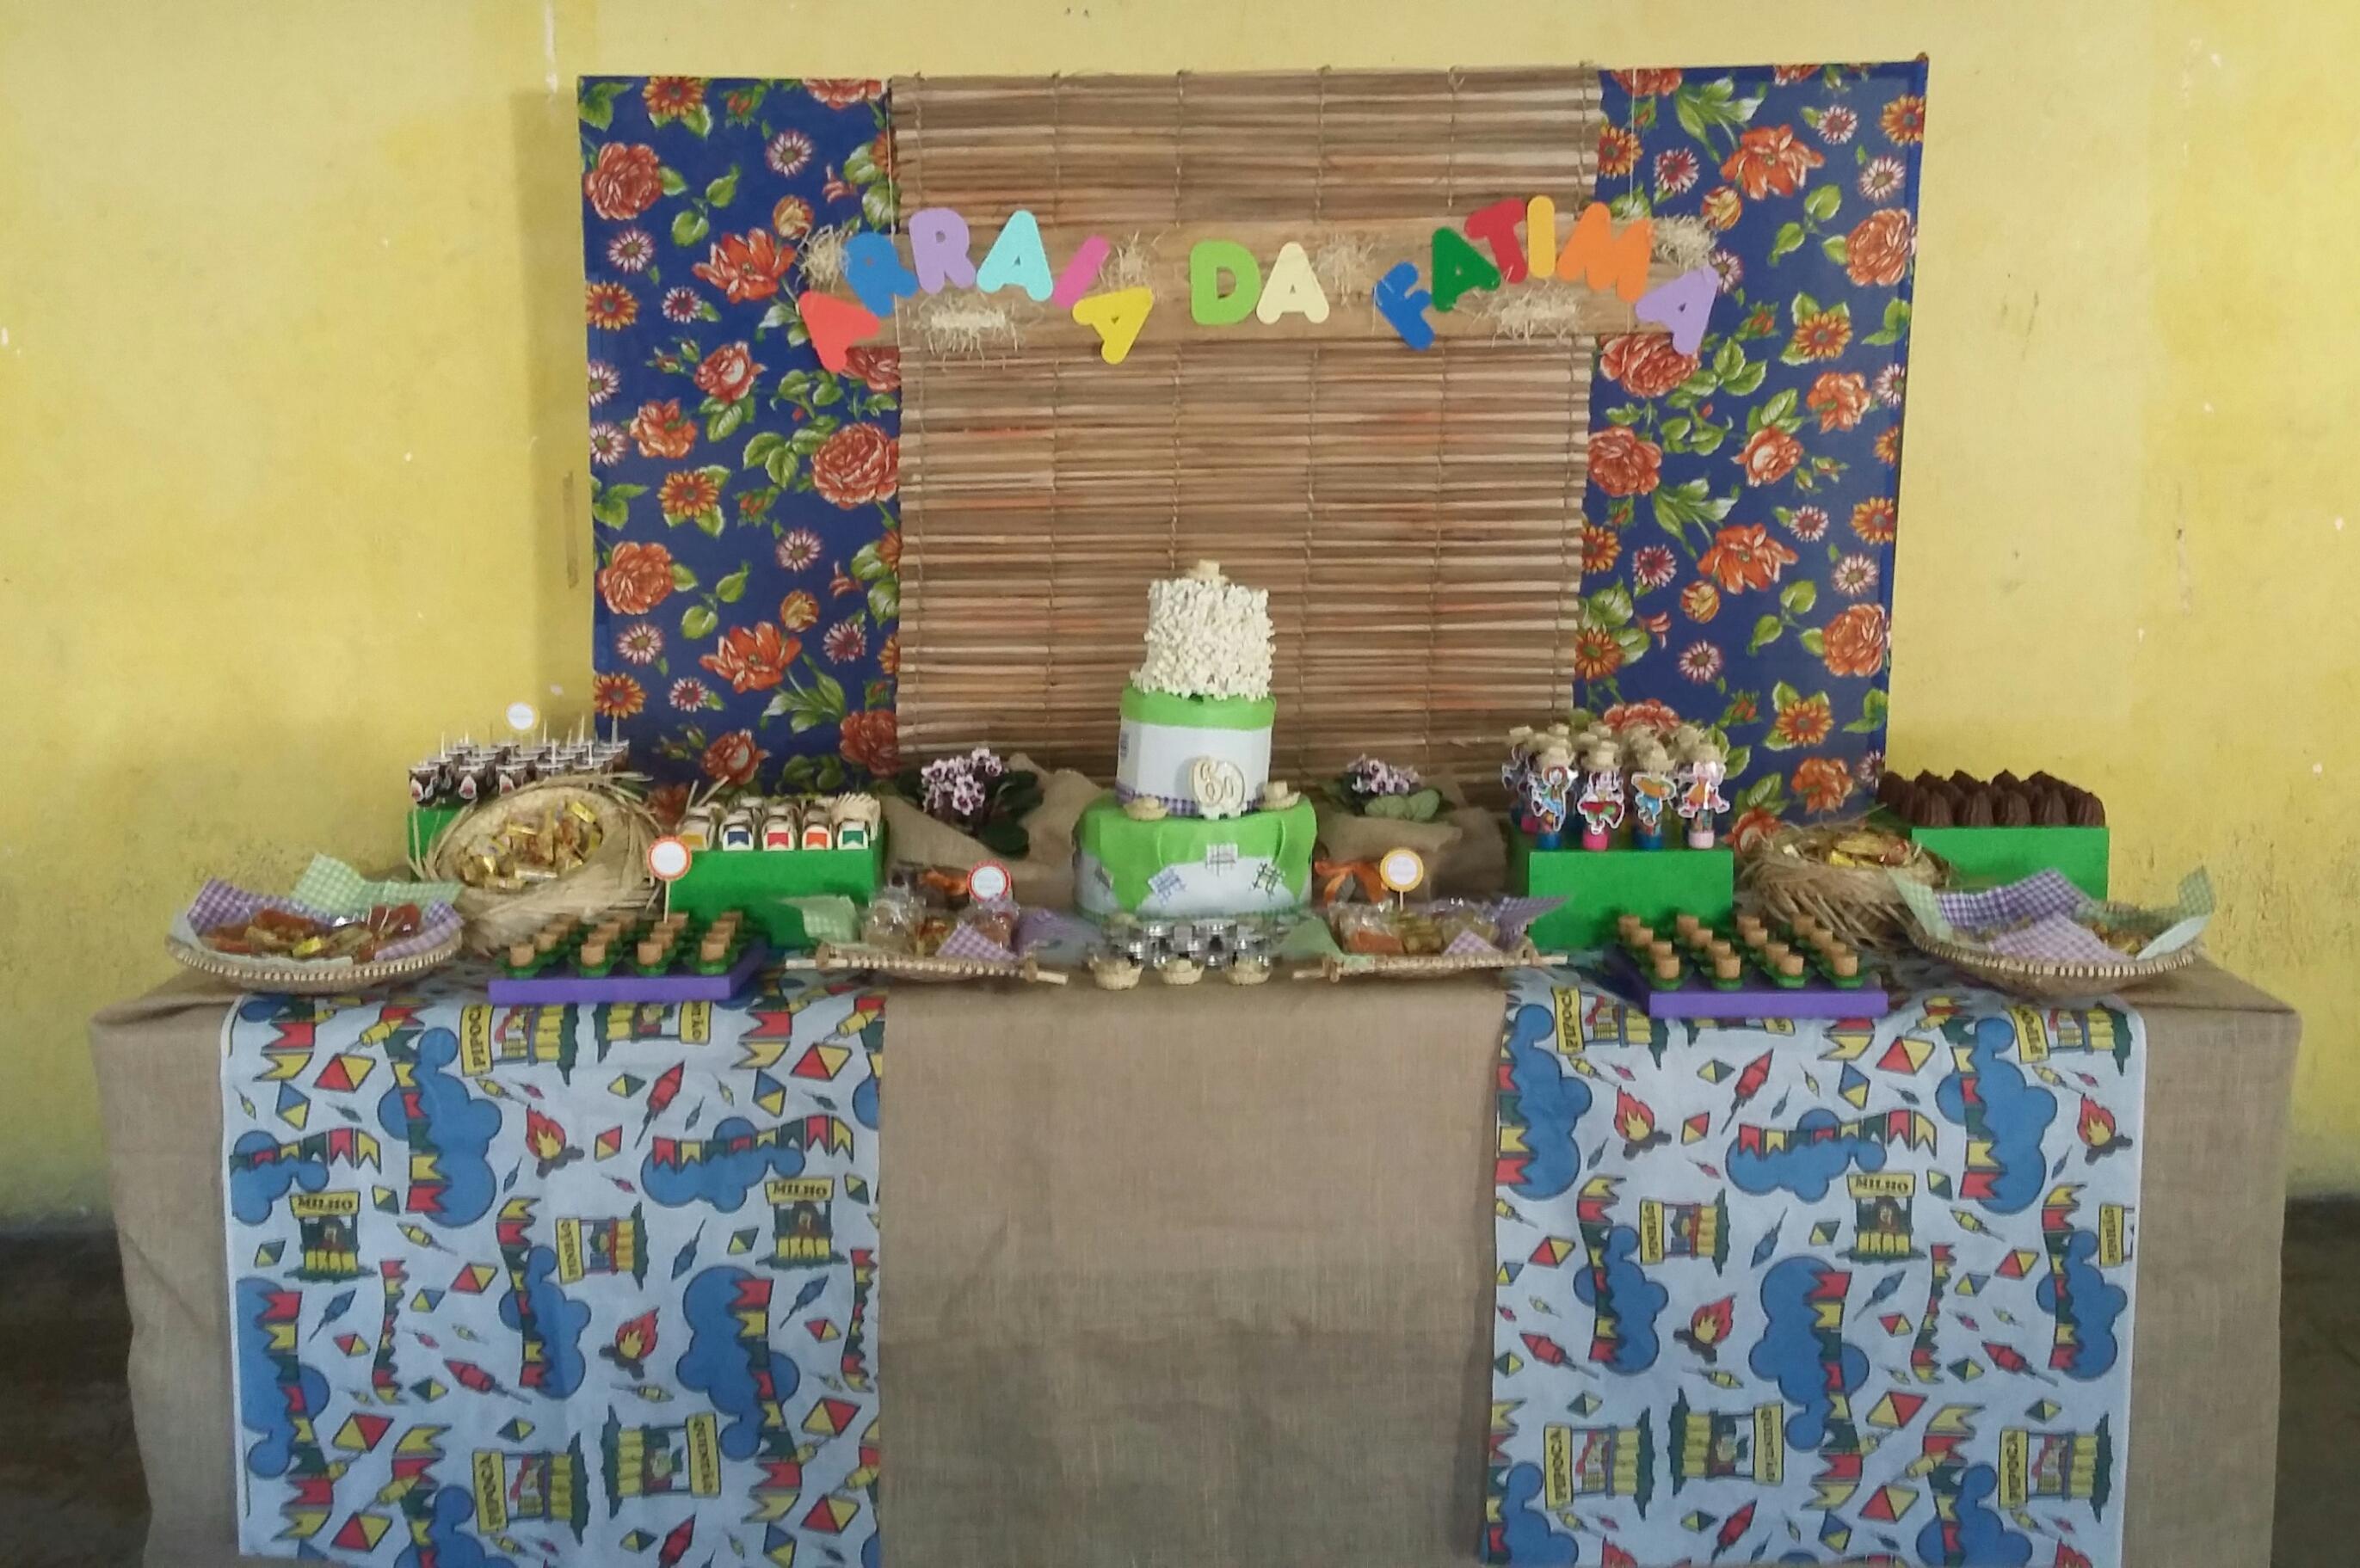 decoracao festa na roca : decoracao festa na roca:decoracao-festa-na-roca-decoracao-festa-caipira